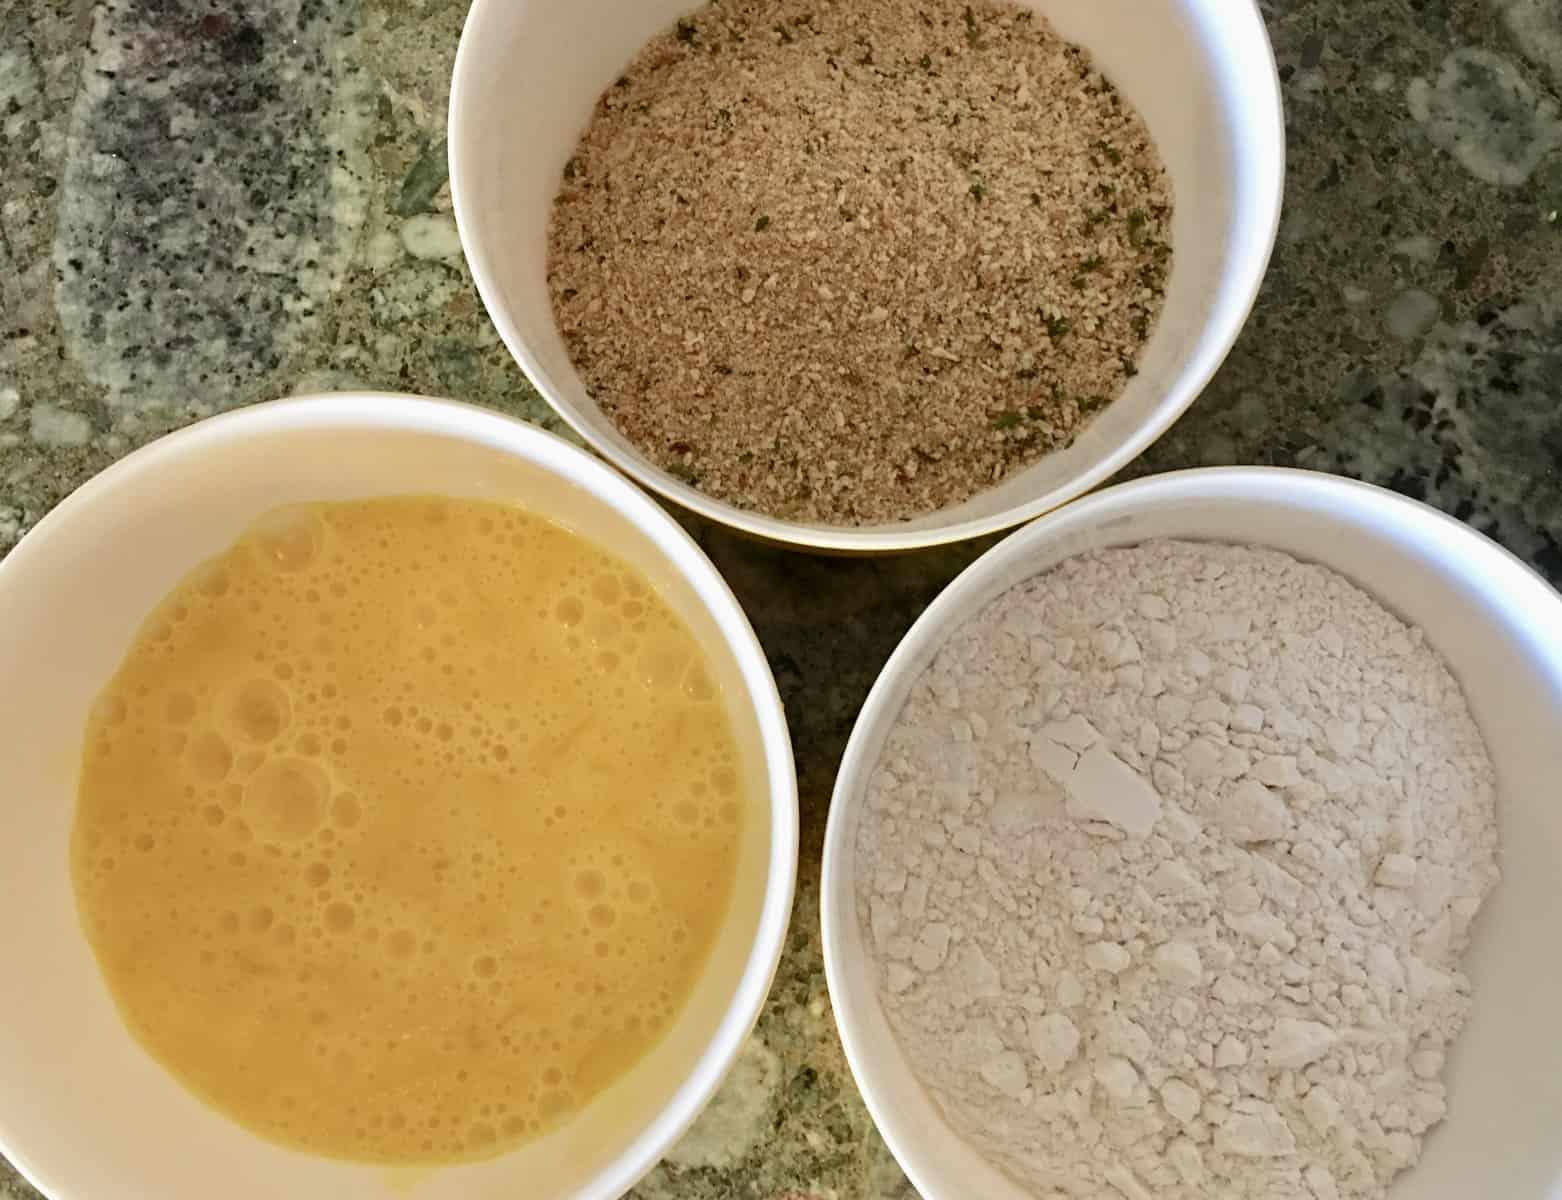 dredging mixture in three bowls.